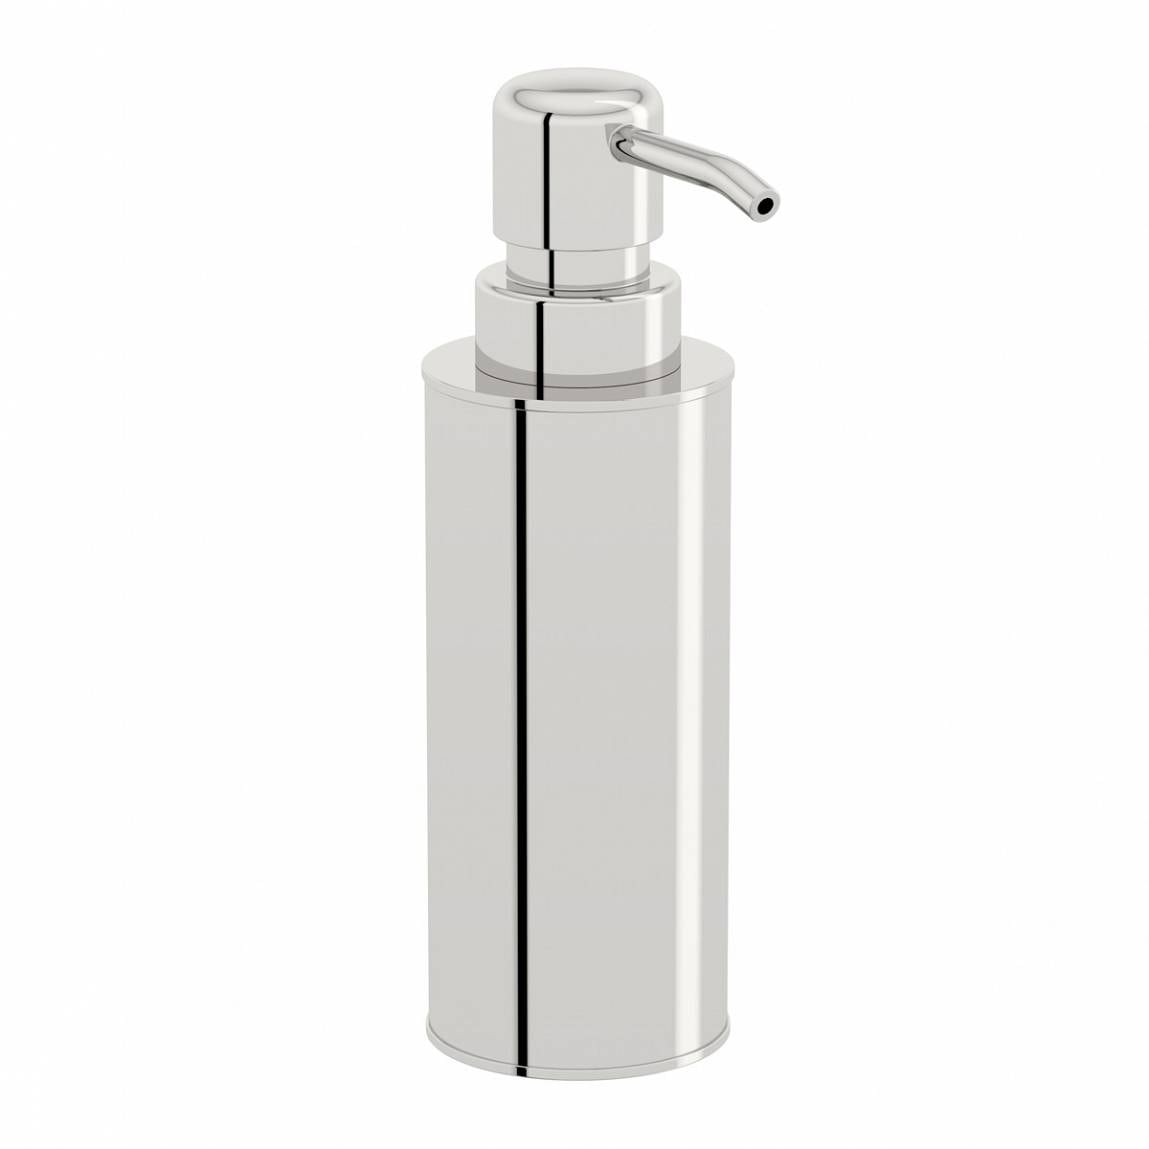 Orchard Options freestanding slim stainless steel soap dispenser